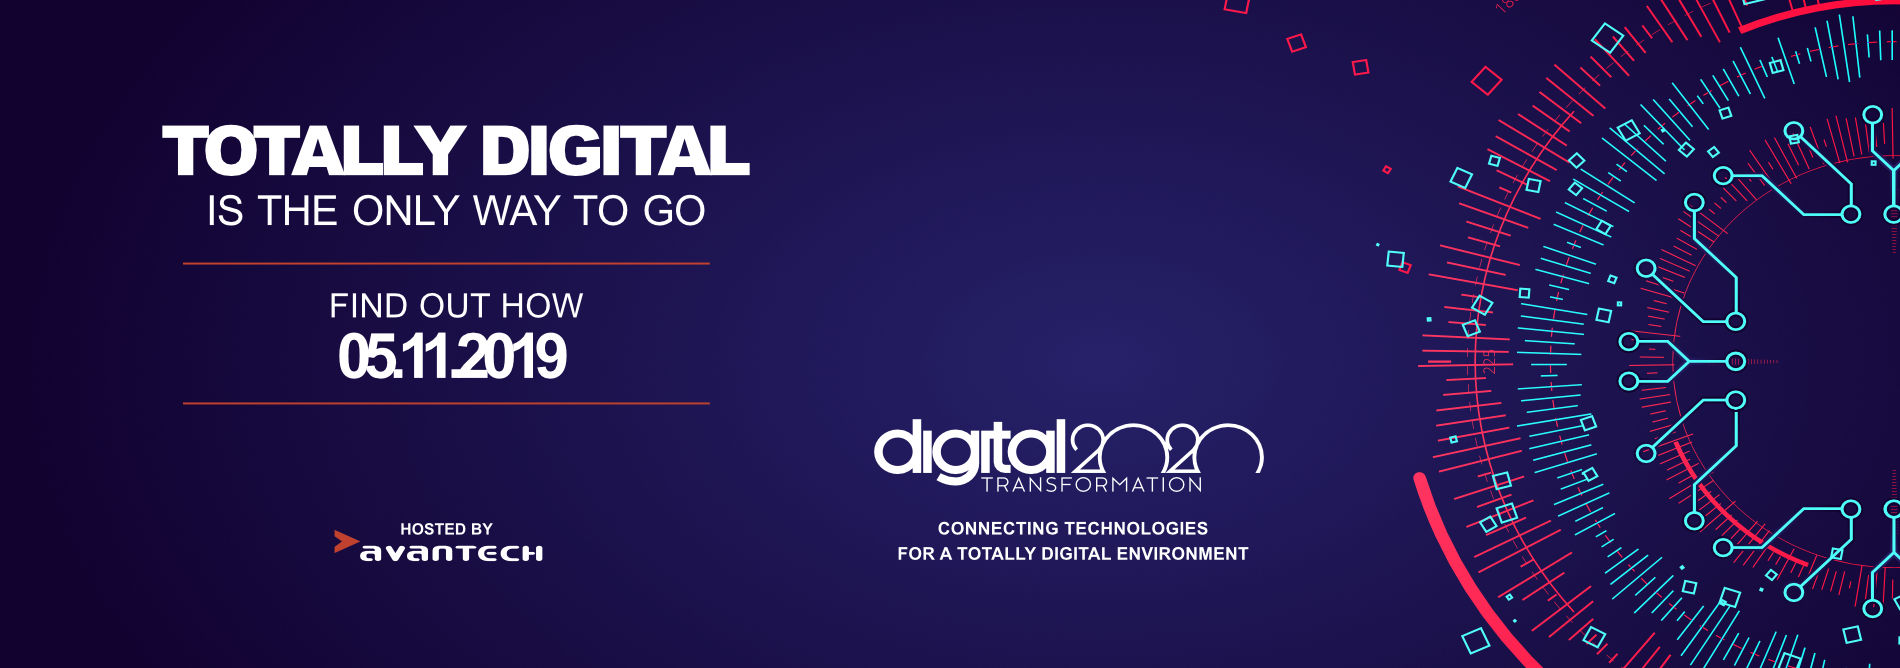 Digital transformation agenda_page banner